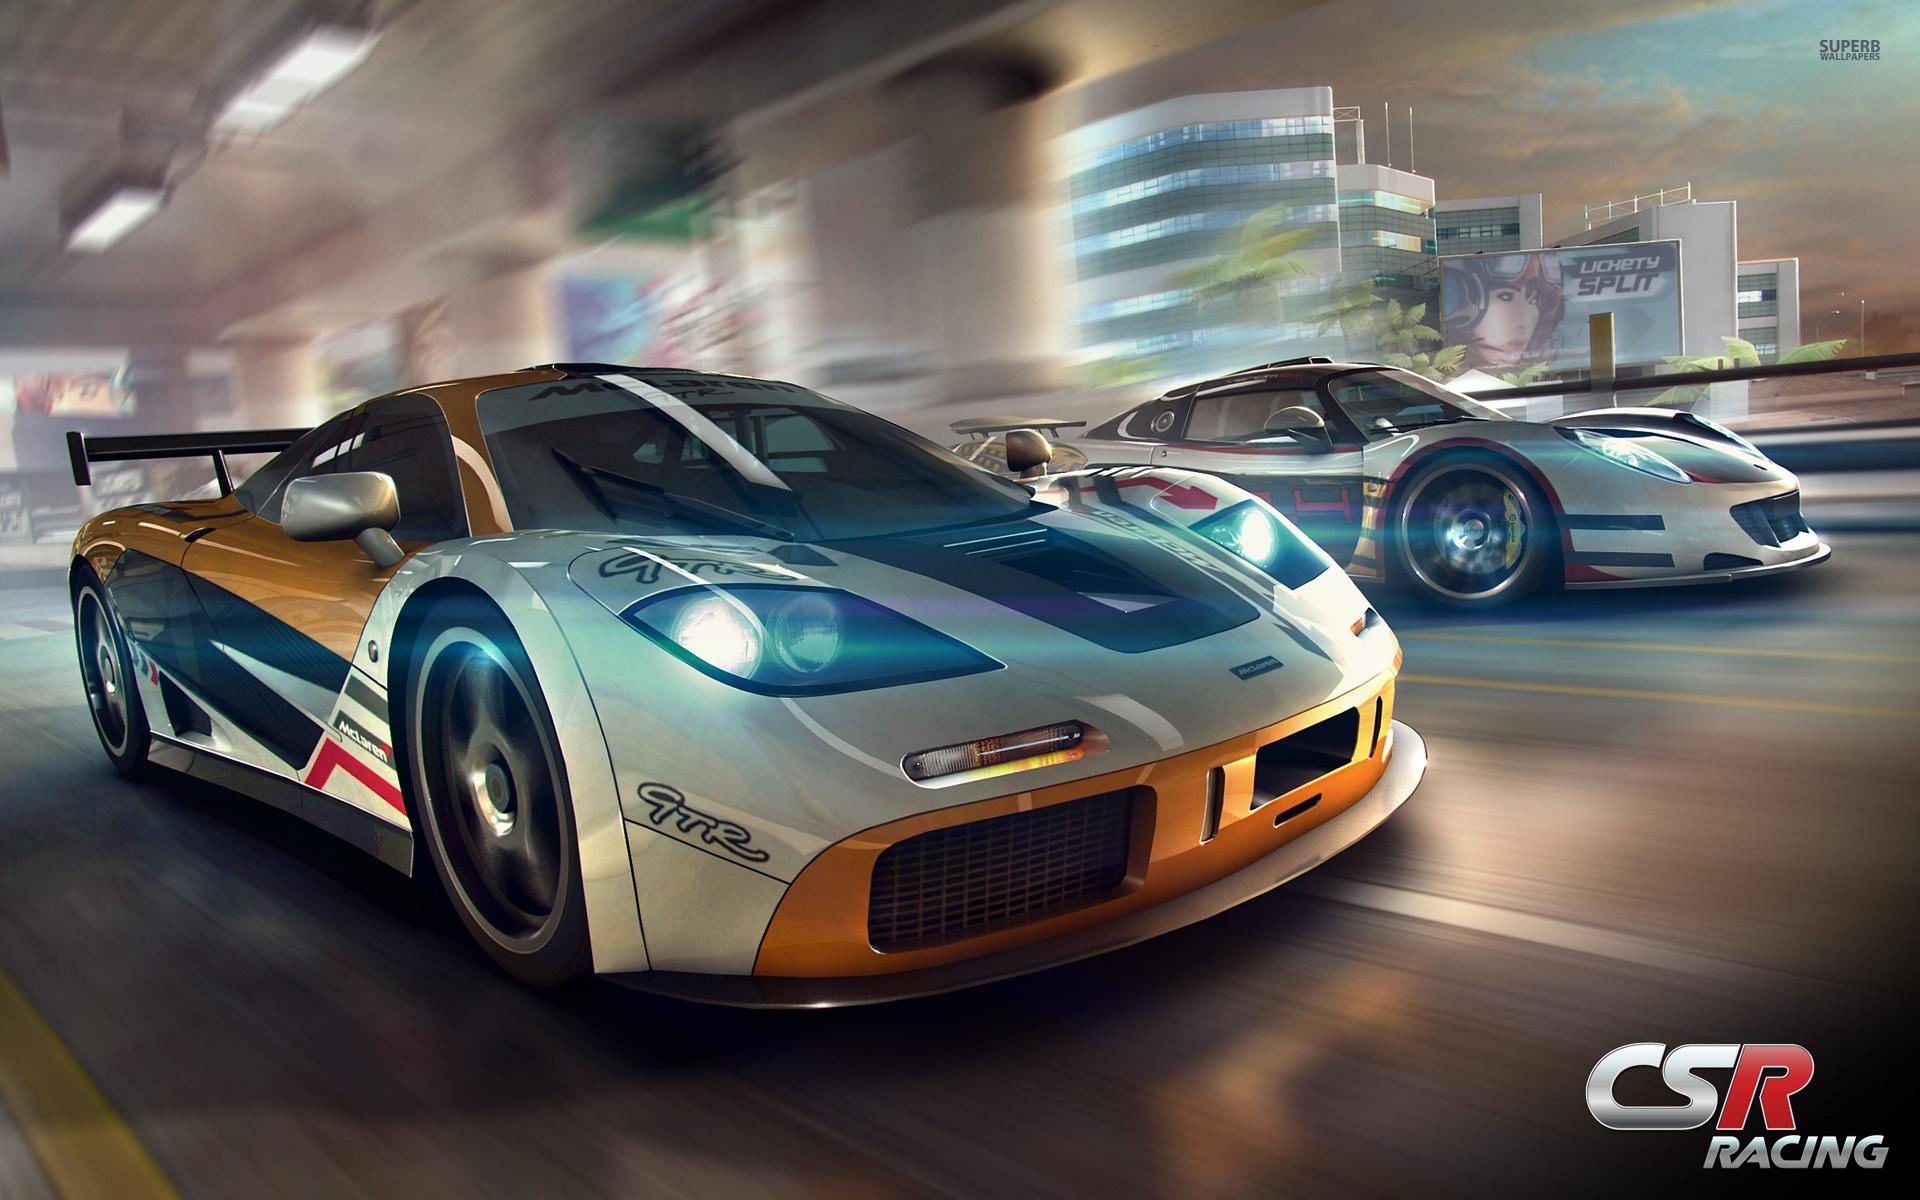 Cheat hack CSR Racing v3.3.0 Unlimited Gold and Money; csr racing hack ; csr racing mod apk ; Data Obb Android no survey no root no jailbreak